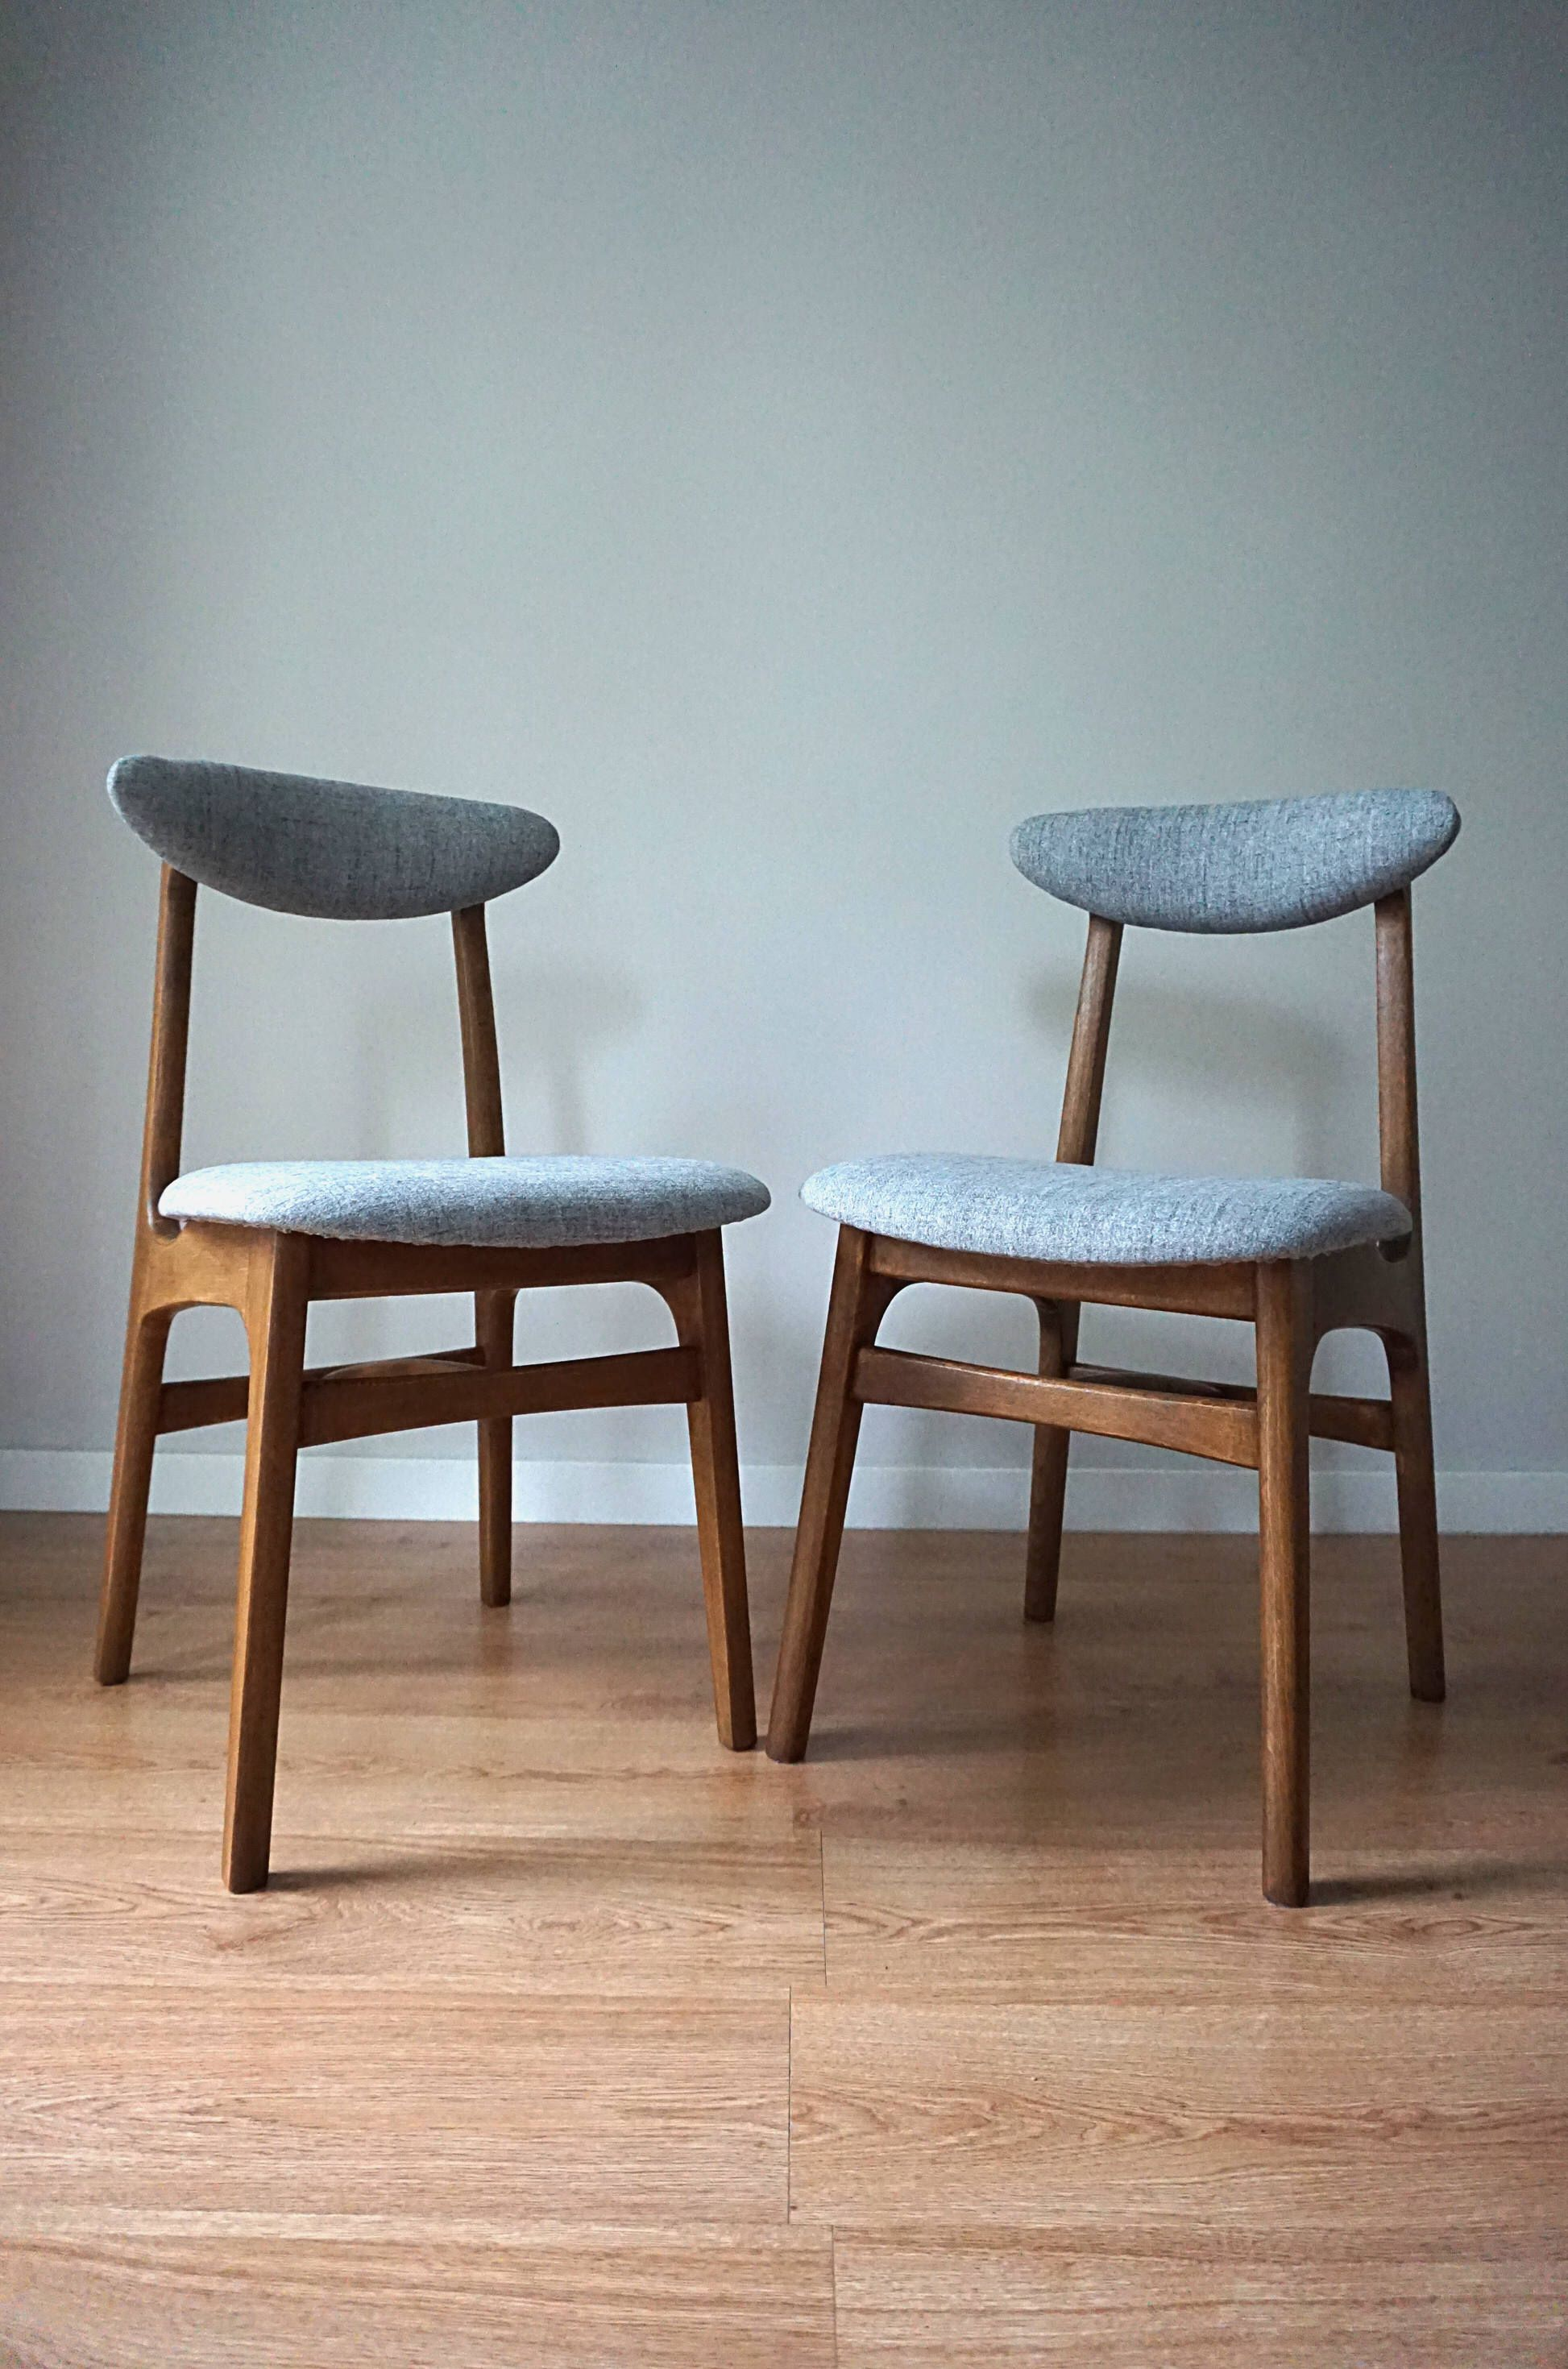 Pair Of Rare Vintage Mid Century Danish Modern 60s Chairs Retro Polish Dining Chair Scandinavian Design